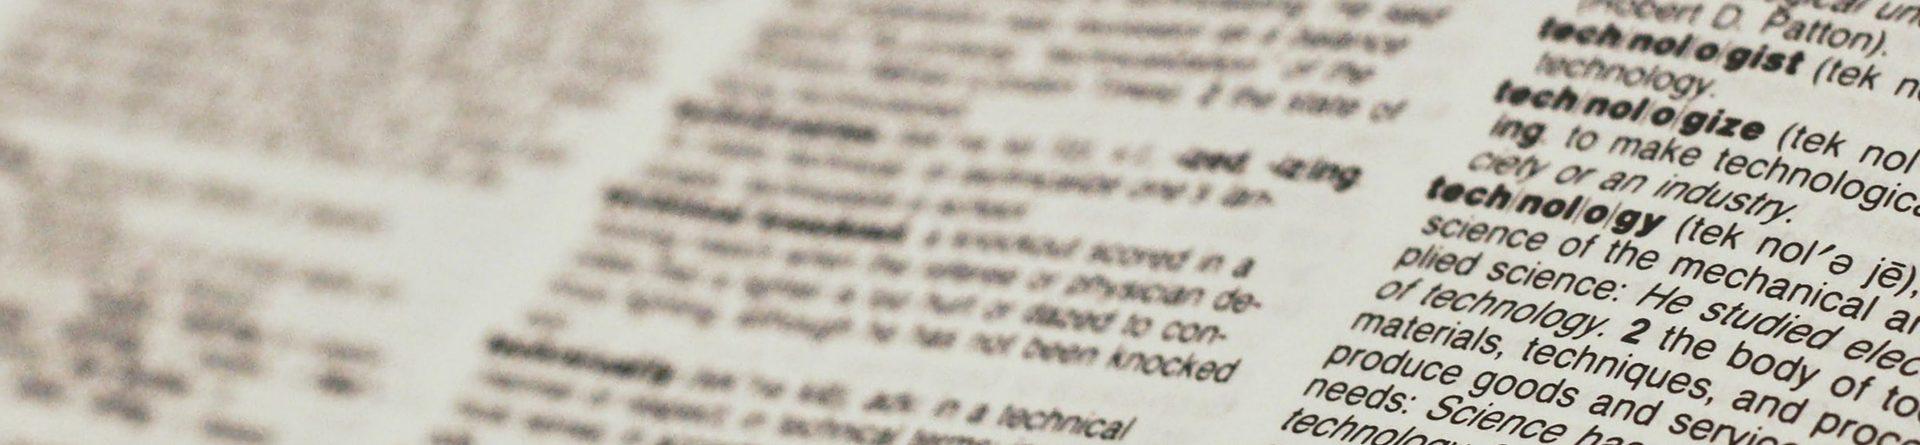 English language courses in New Zealand